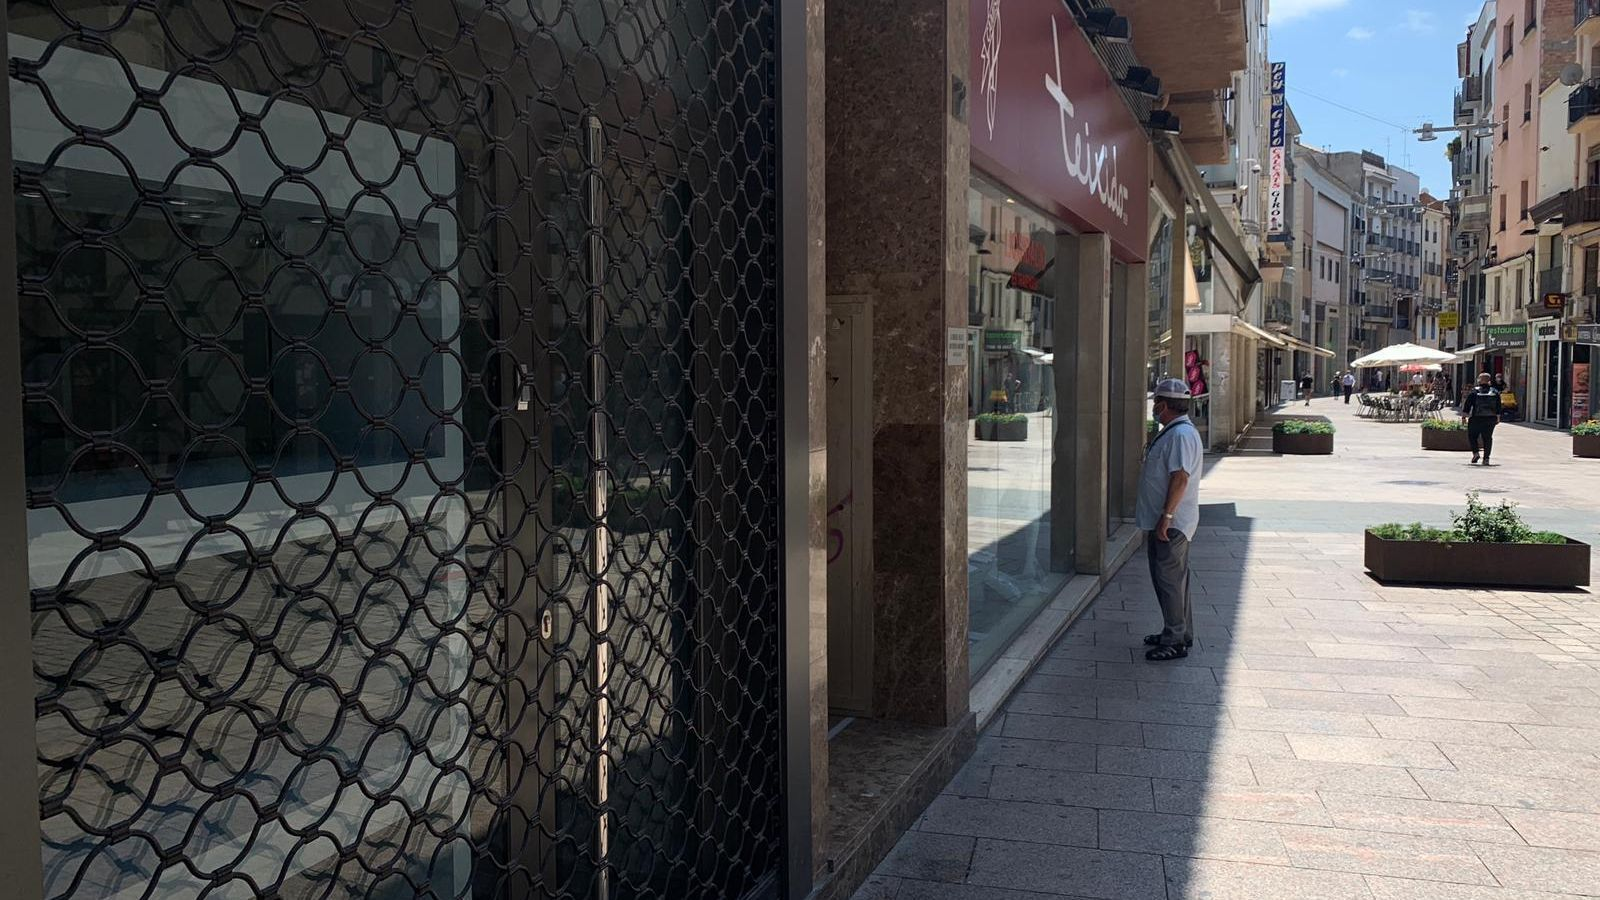 Comerços del centre històric de Lleida